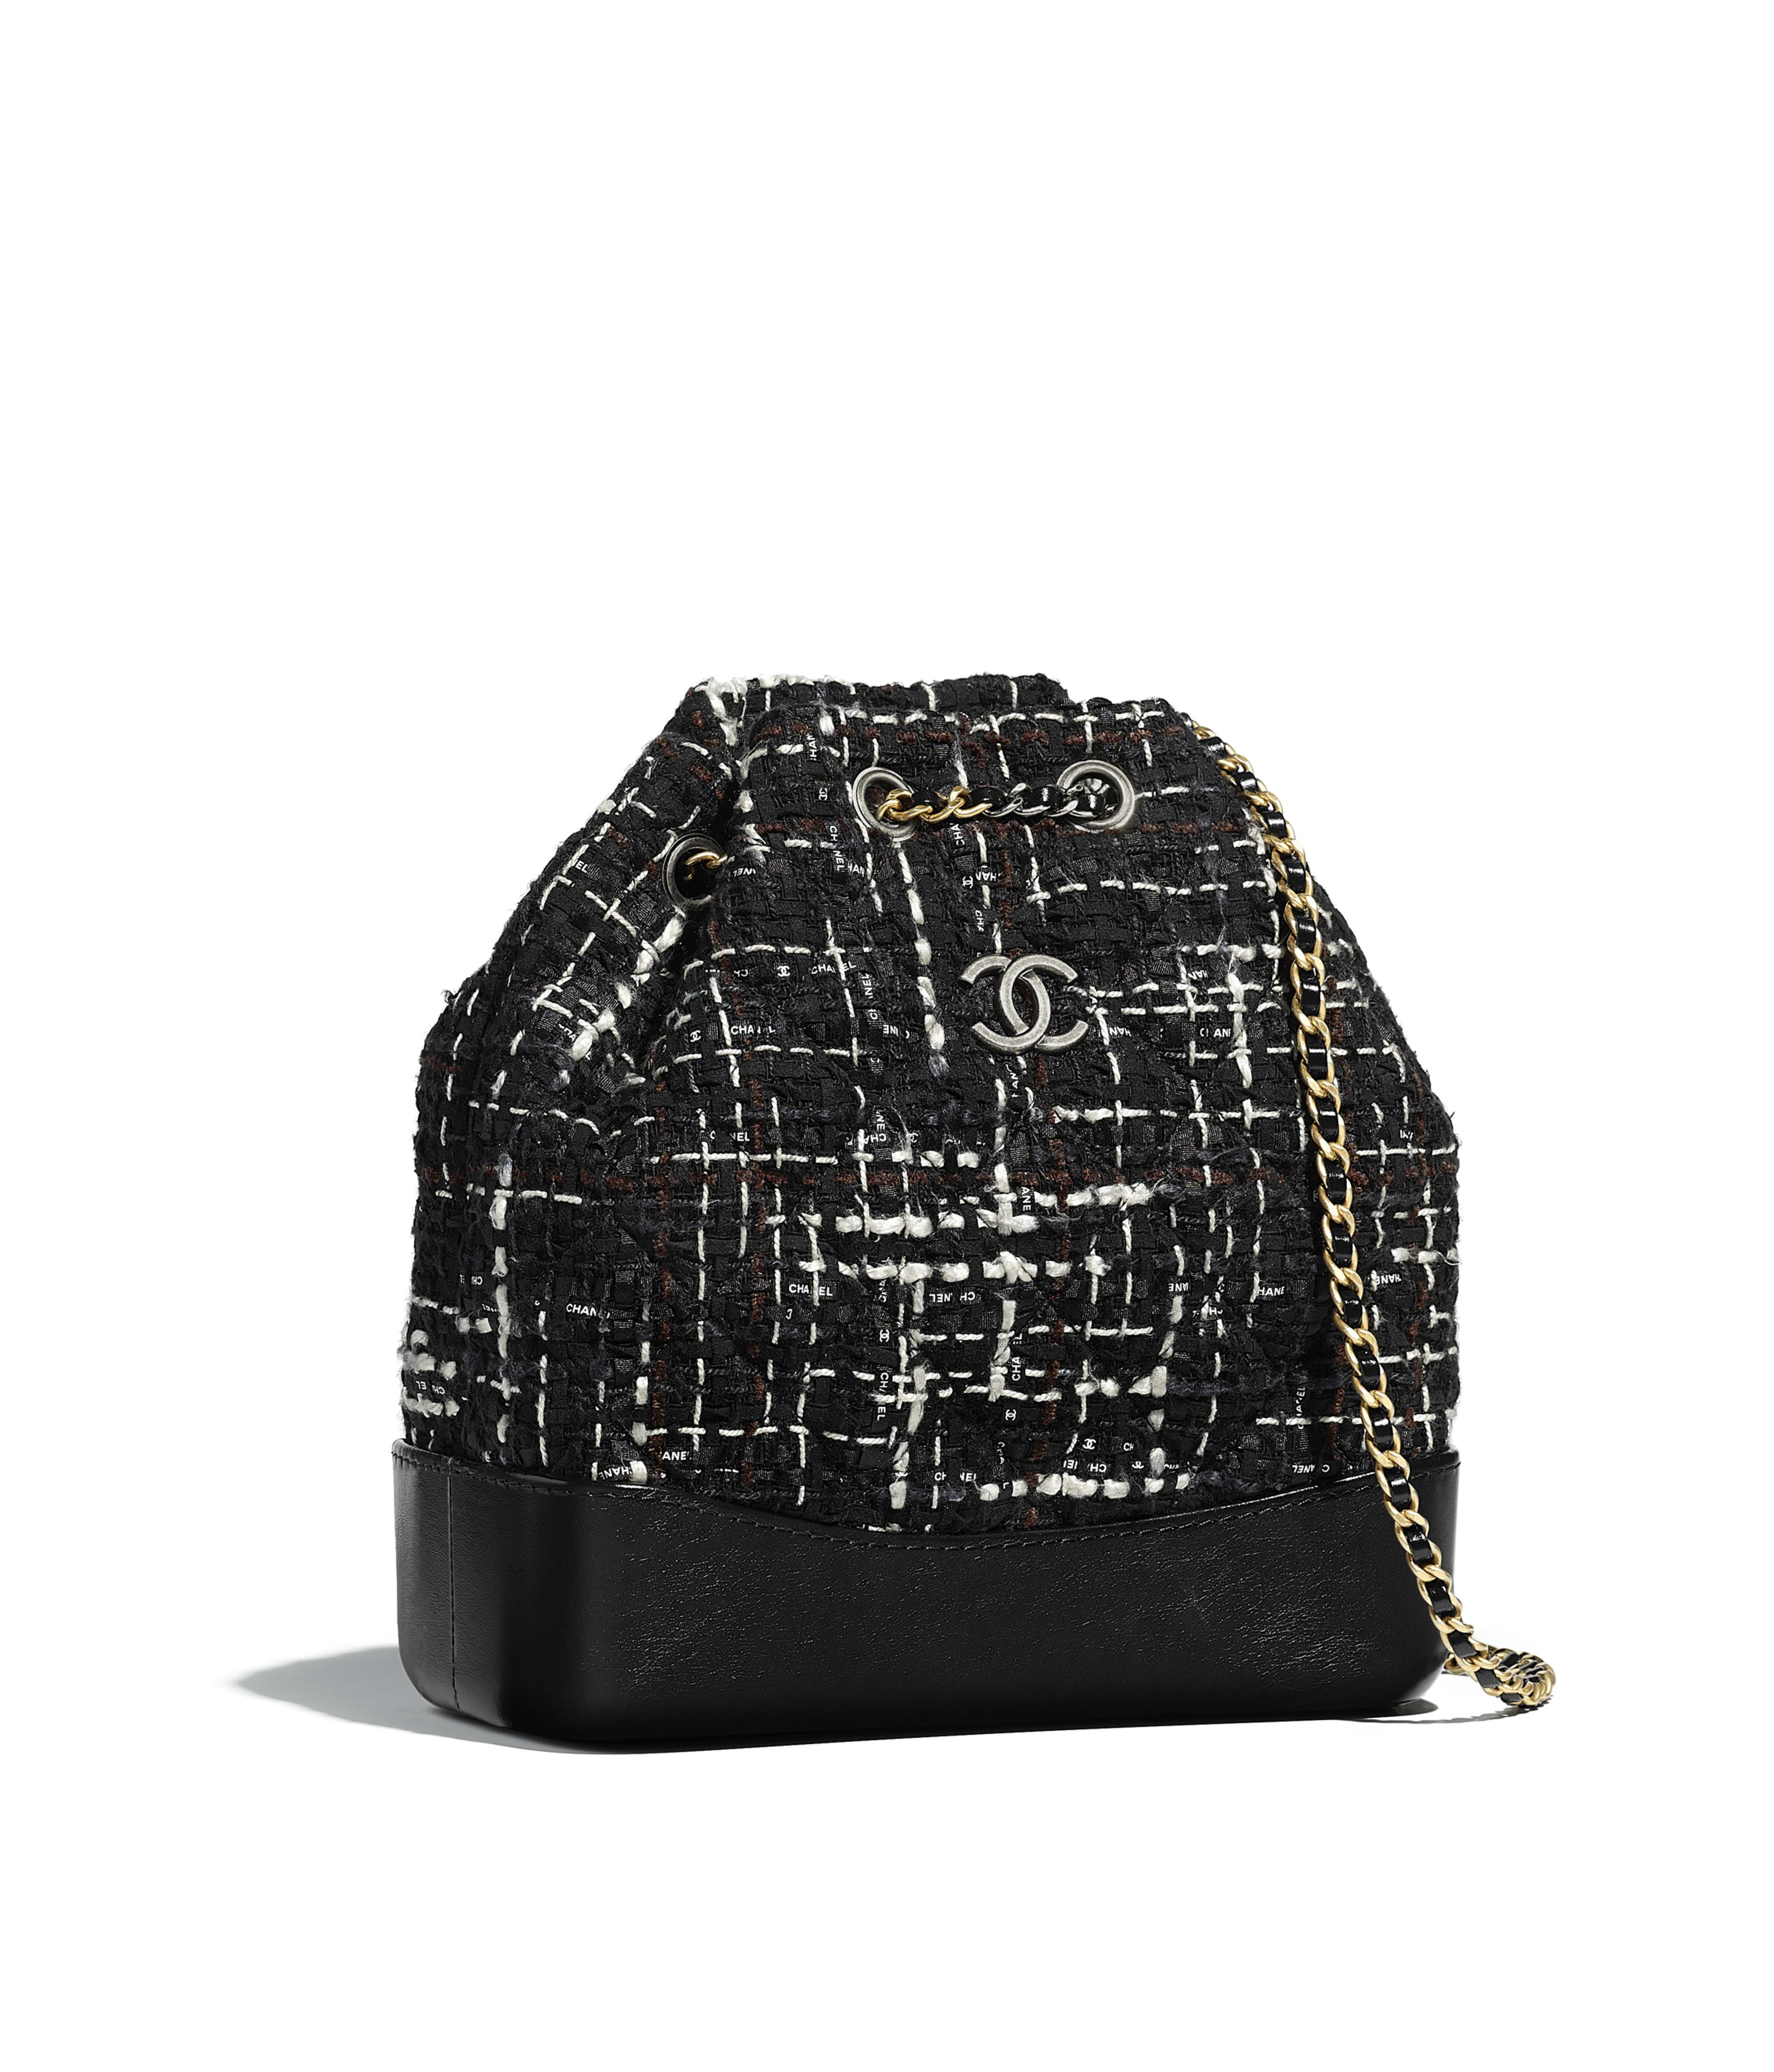 Chanel S Gabrielle Small Backpack Tweed Calfskin Silver Tone Gold Metal Black Navy Brown Ecru Ref A94485y83781k0991